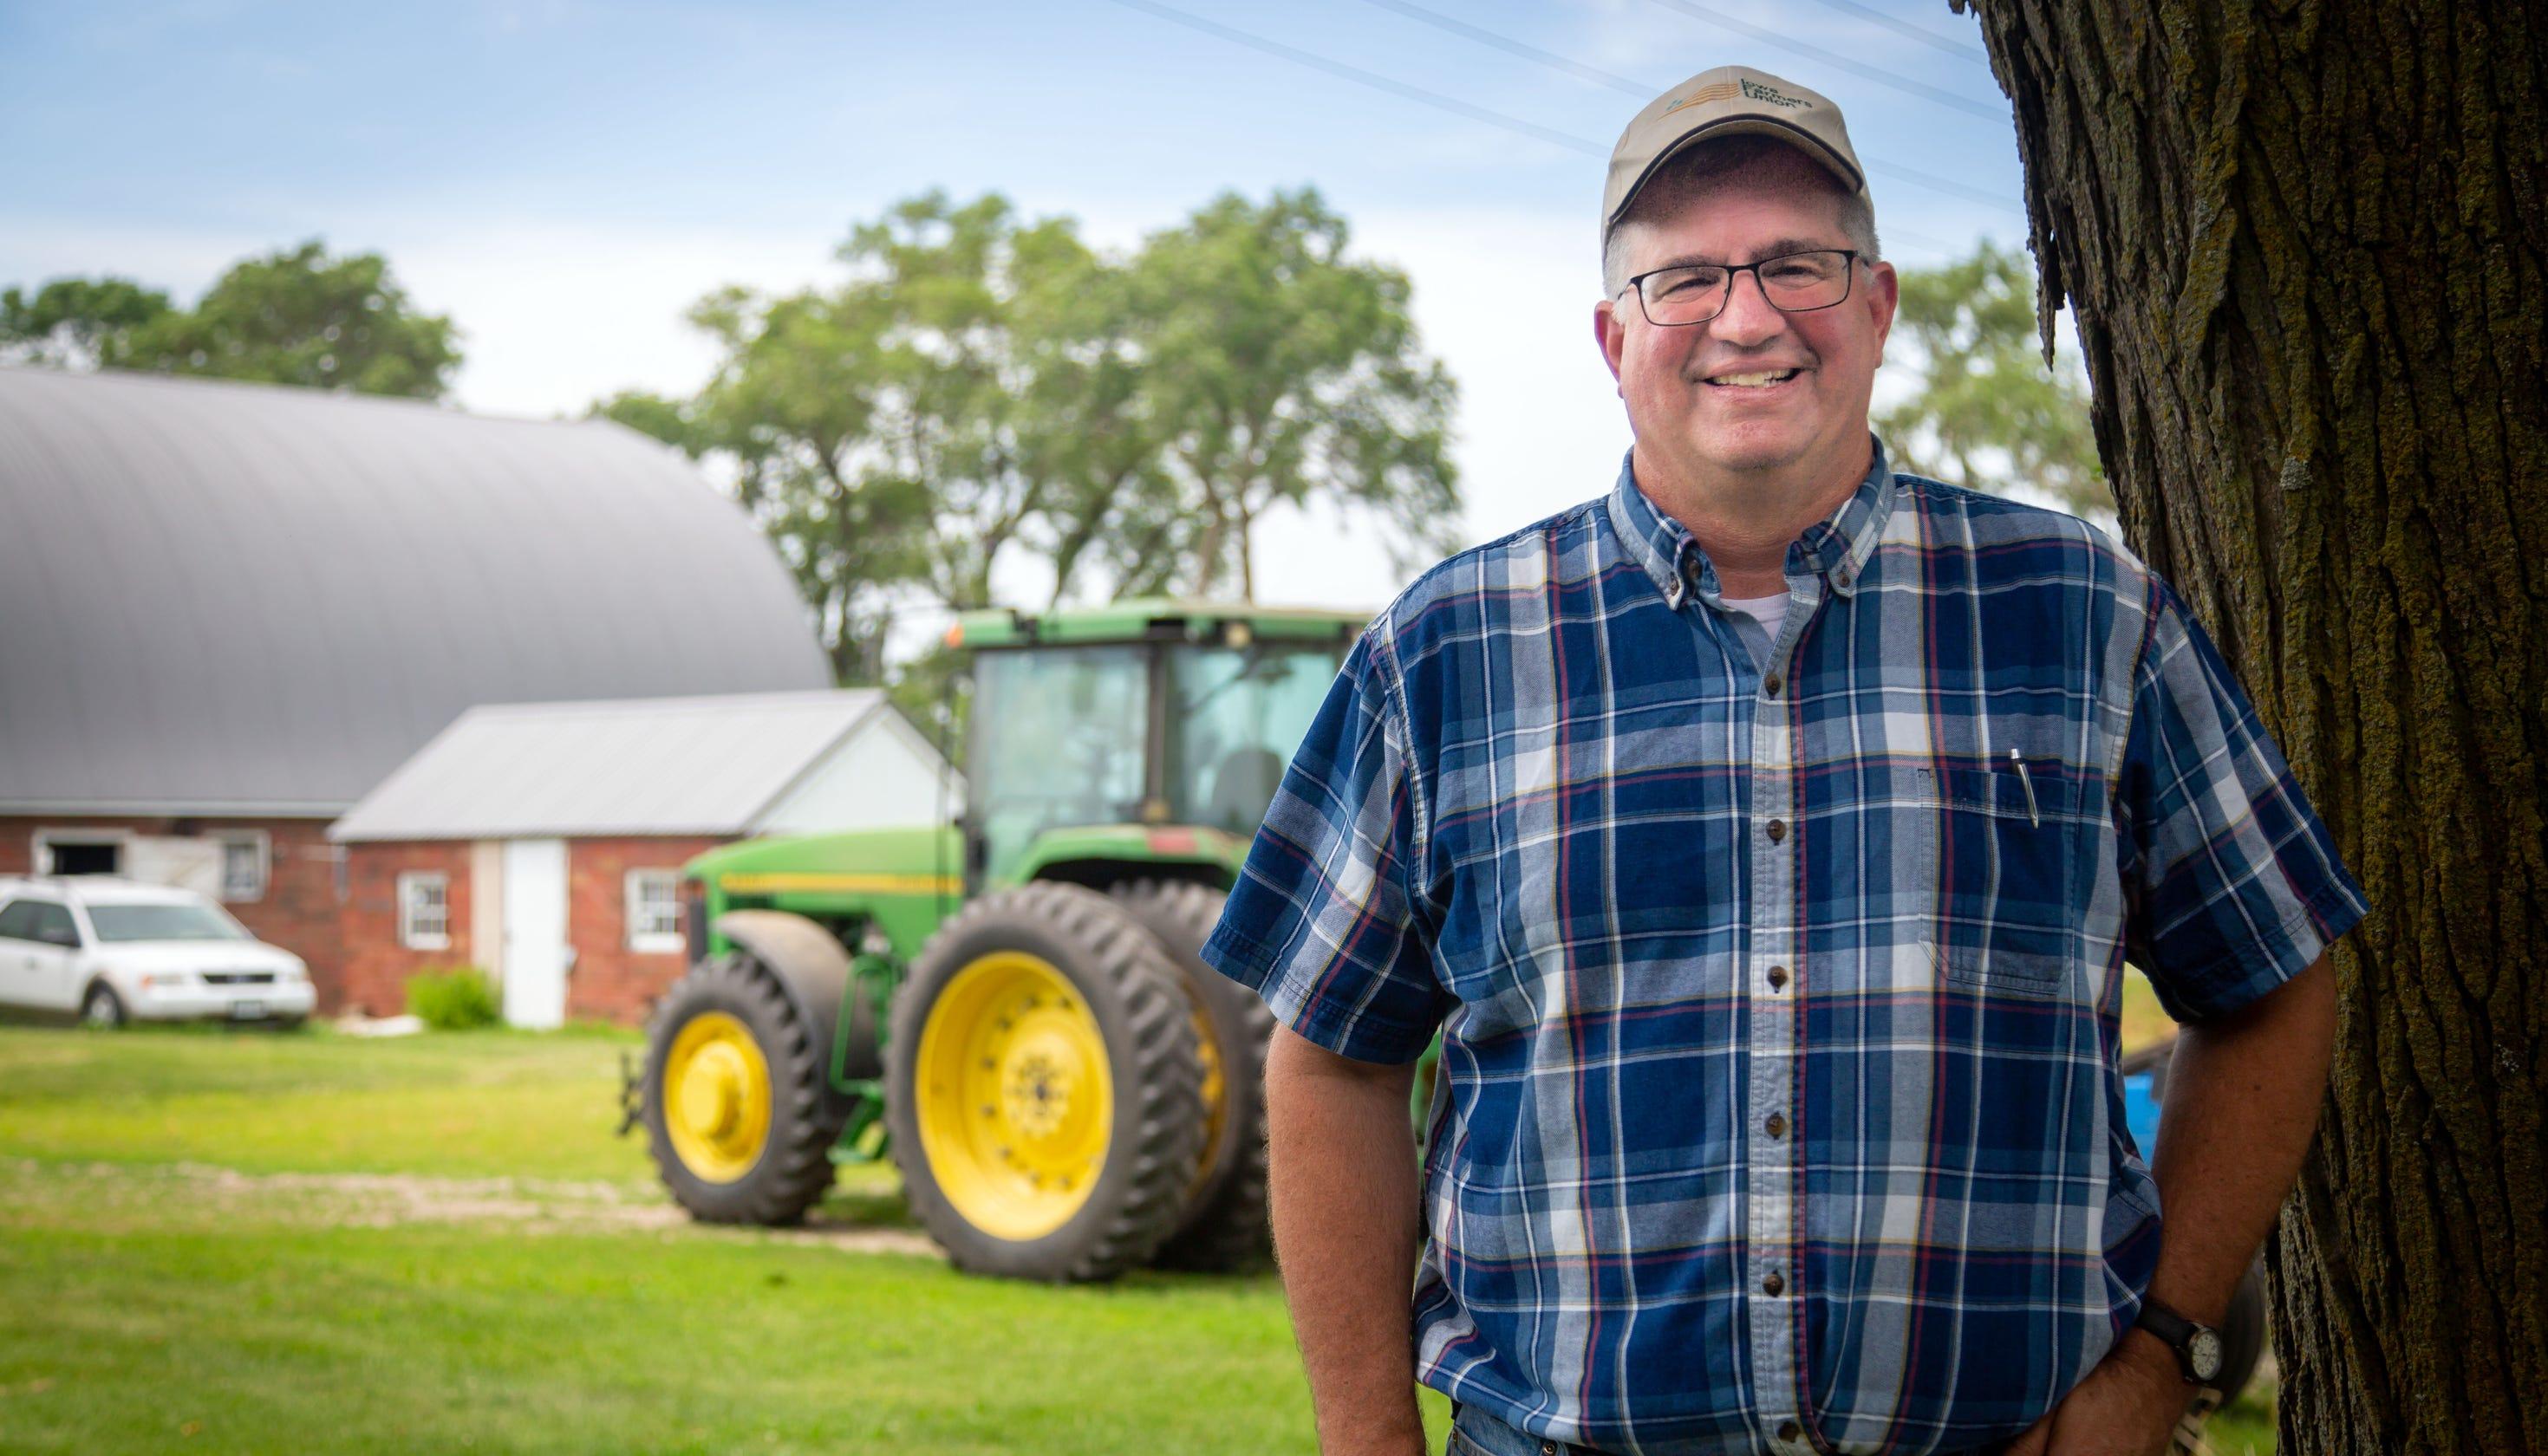 Trump sends nearly $1 billion to Iowa farmers to reduce